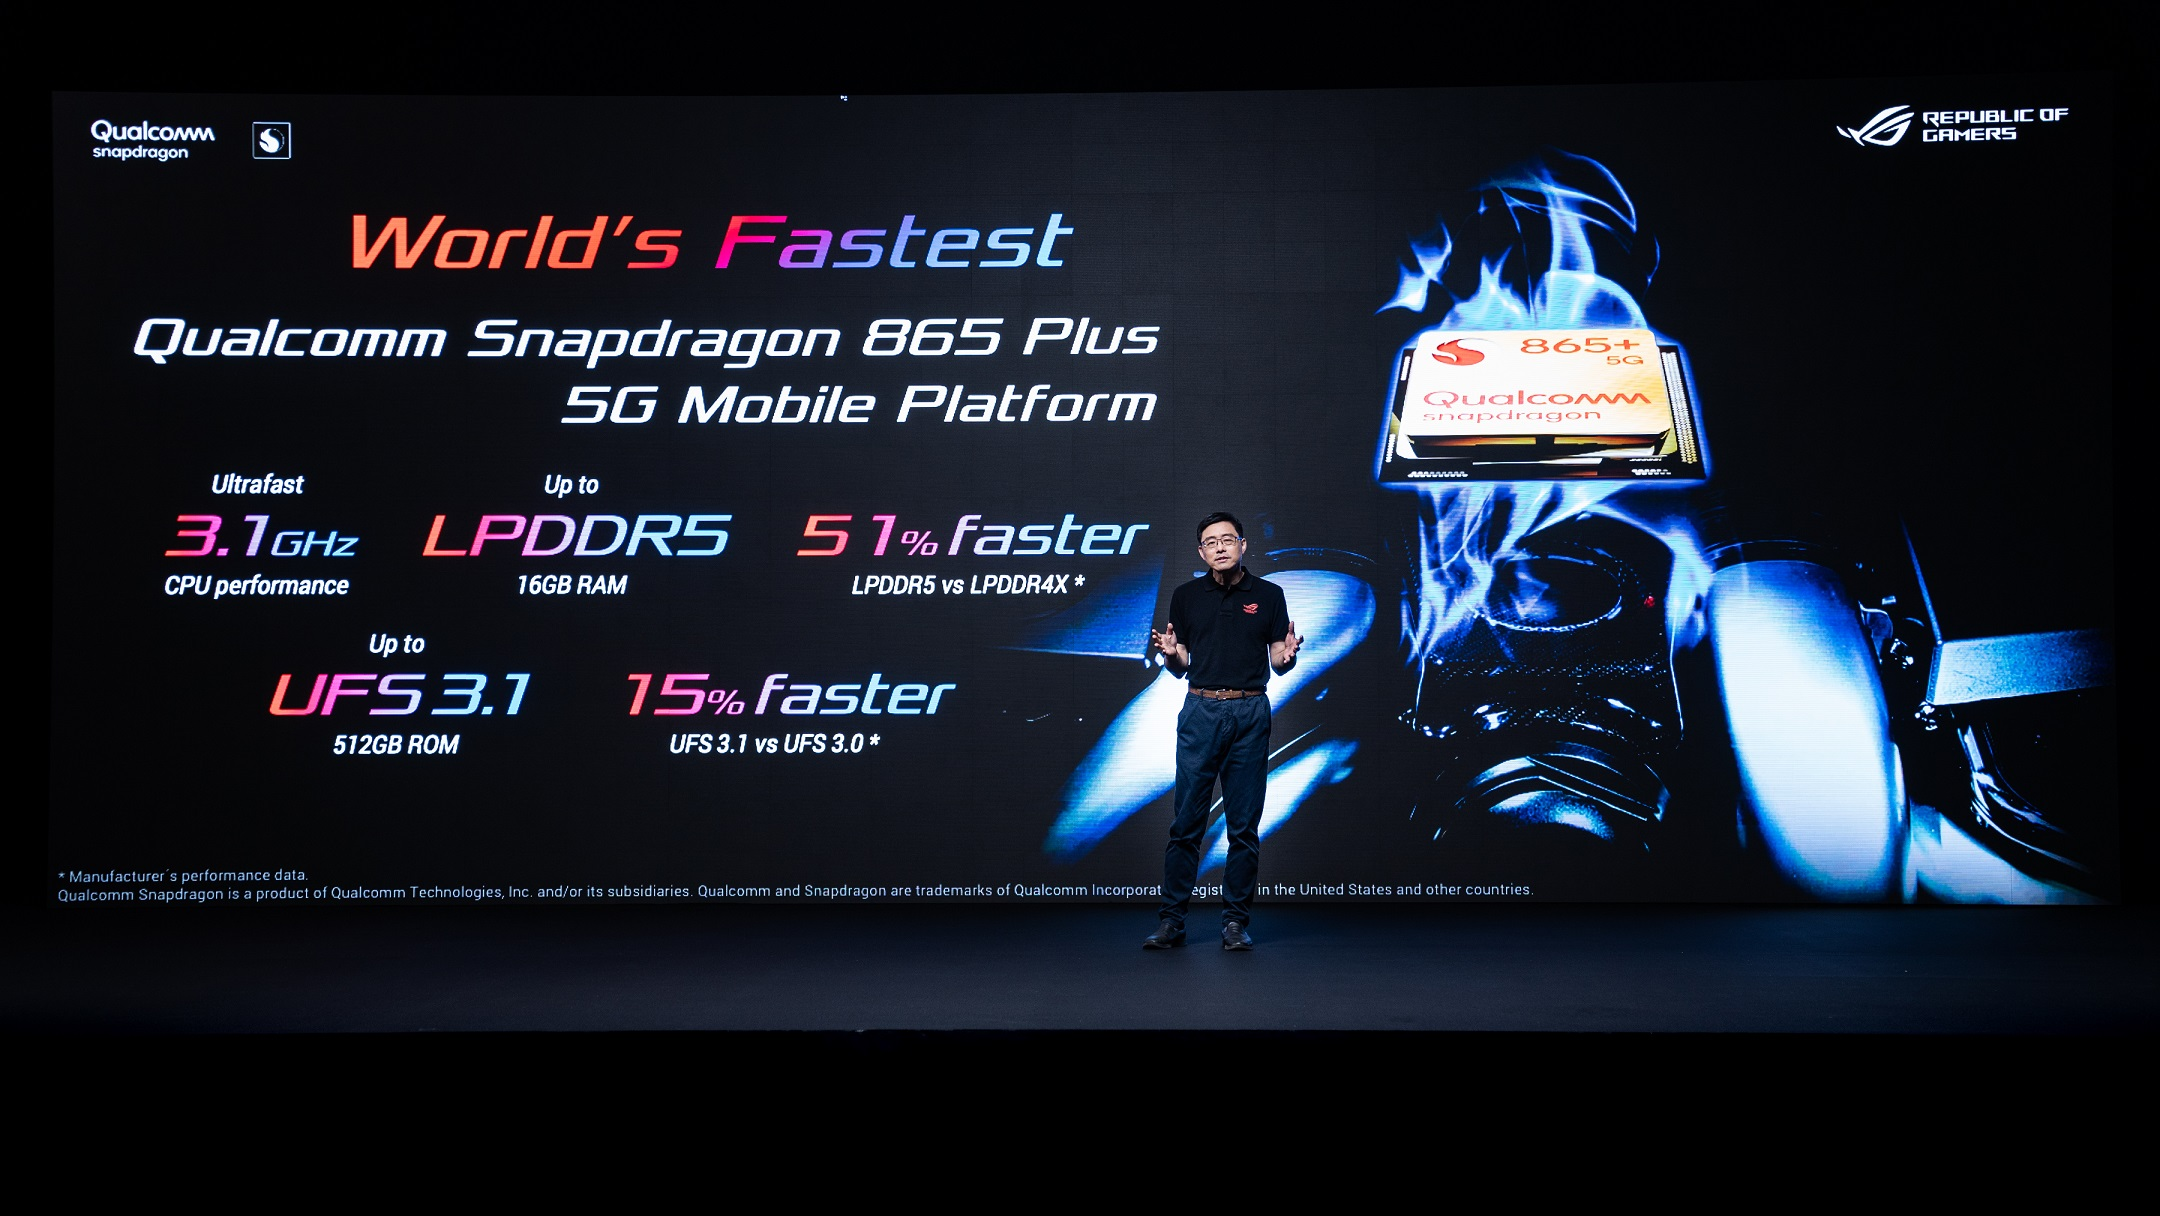 ROG Phone 3電競手機,採用最新Qualcomm® Snapdragon™ 865 Plus 5G 行動運算平台,將為玩家帶來極致非凡的手遊體驗。